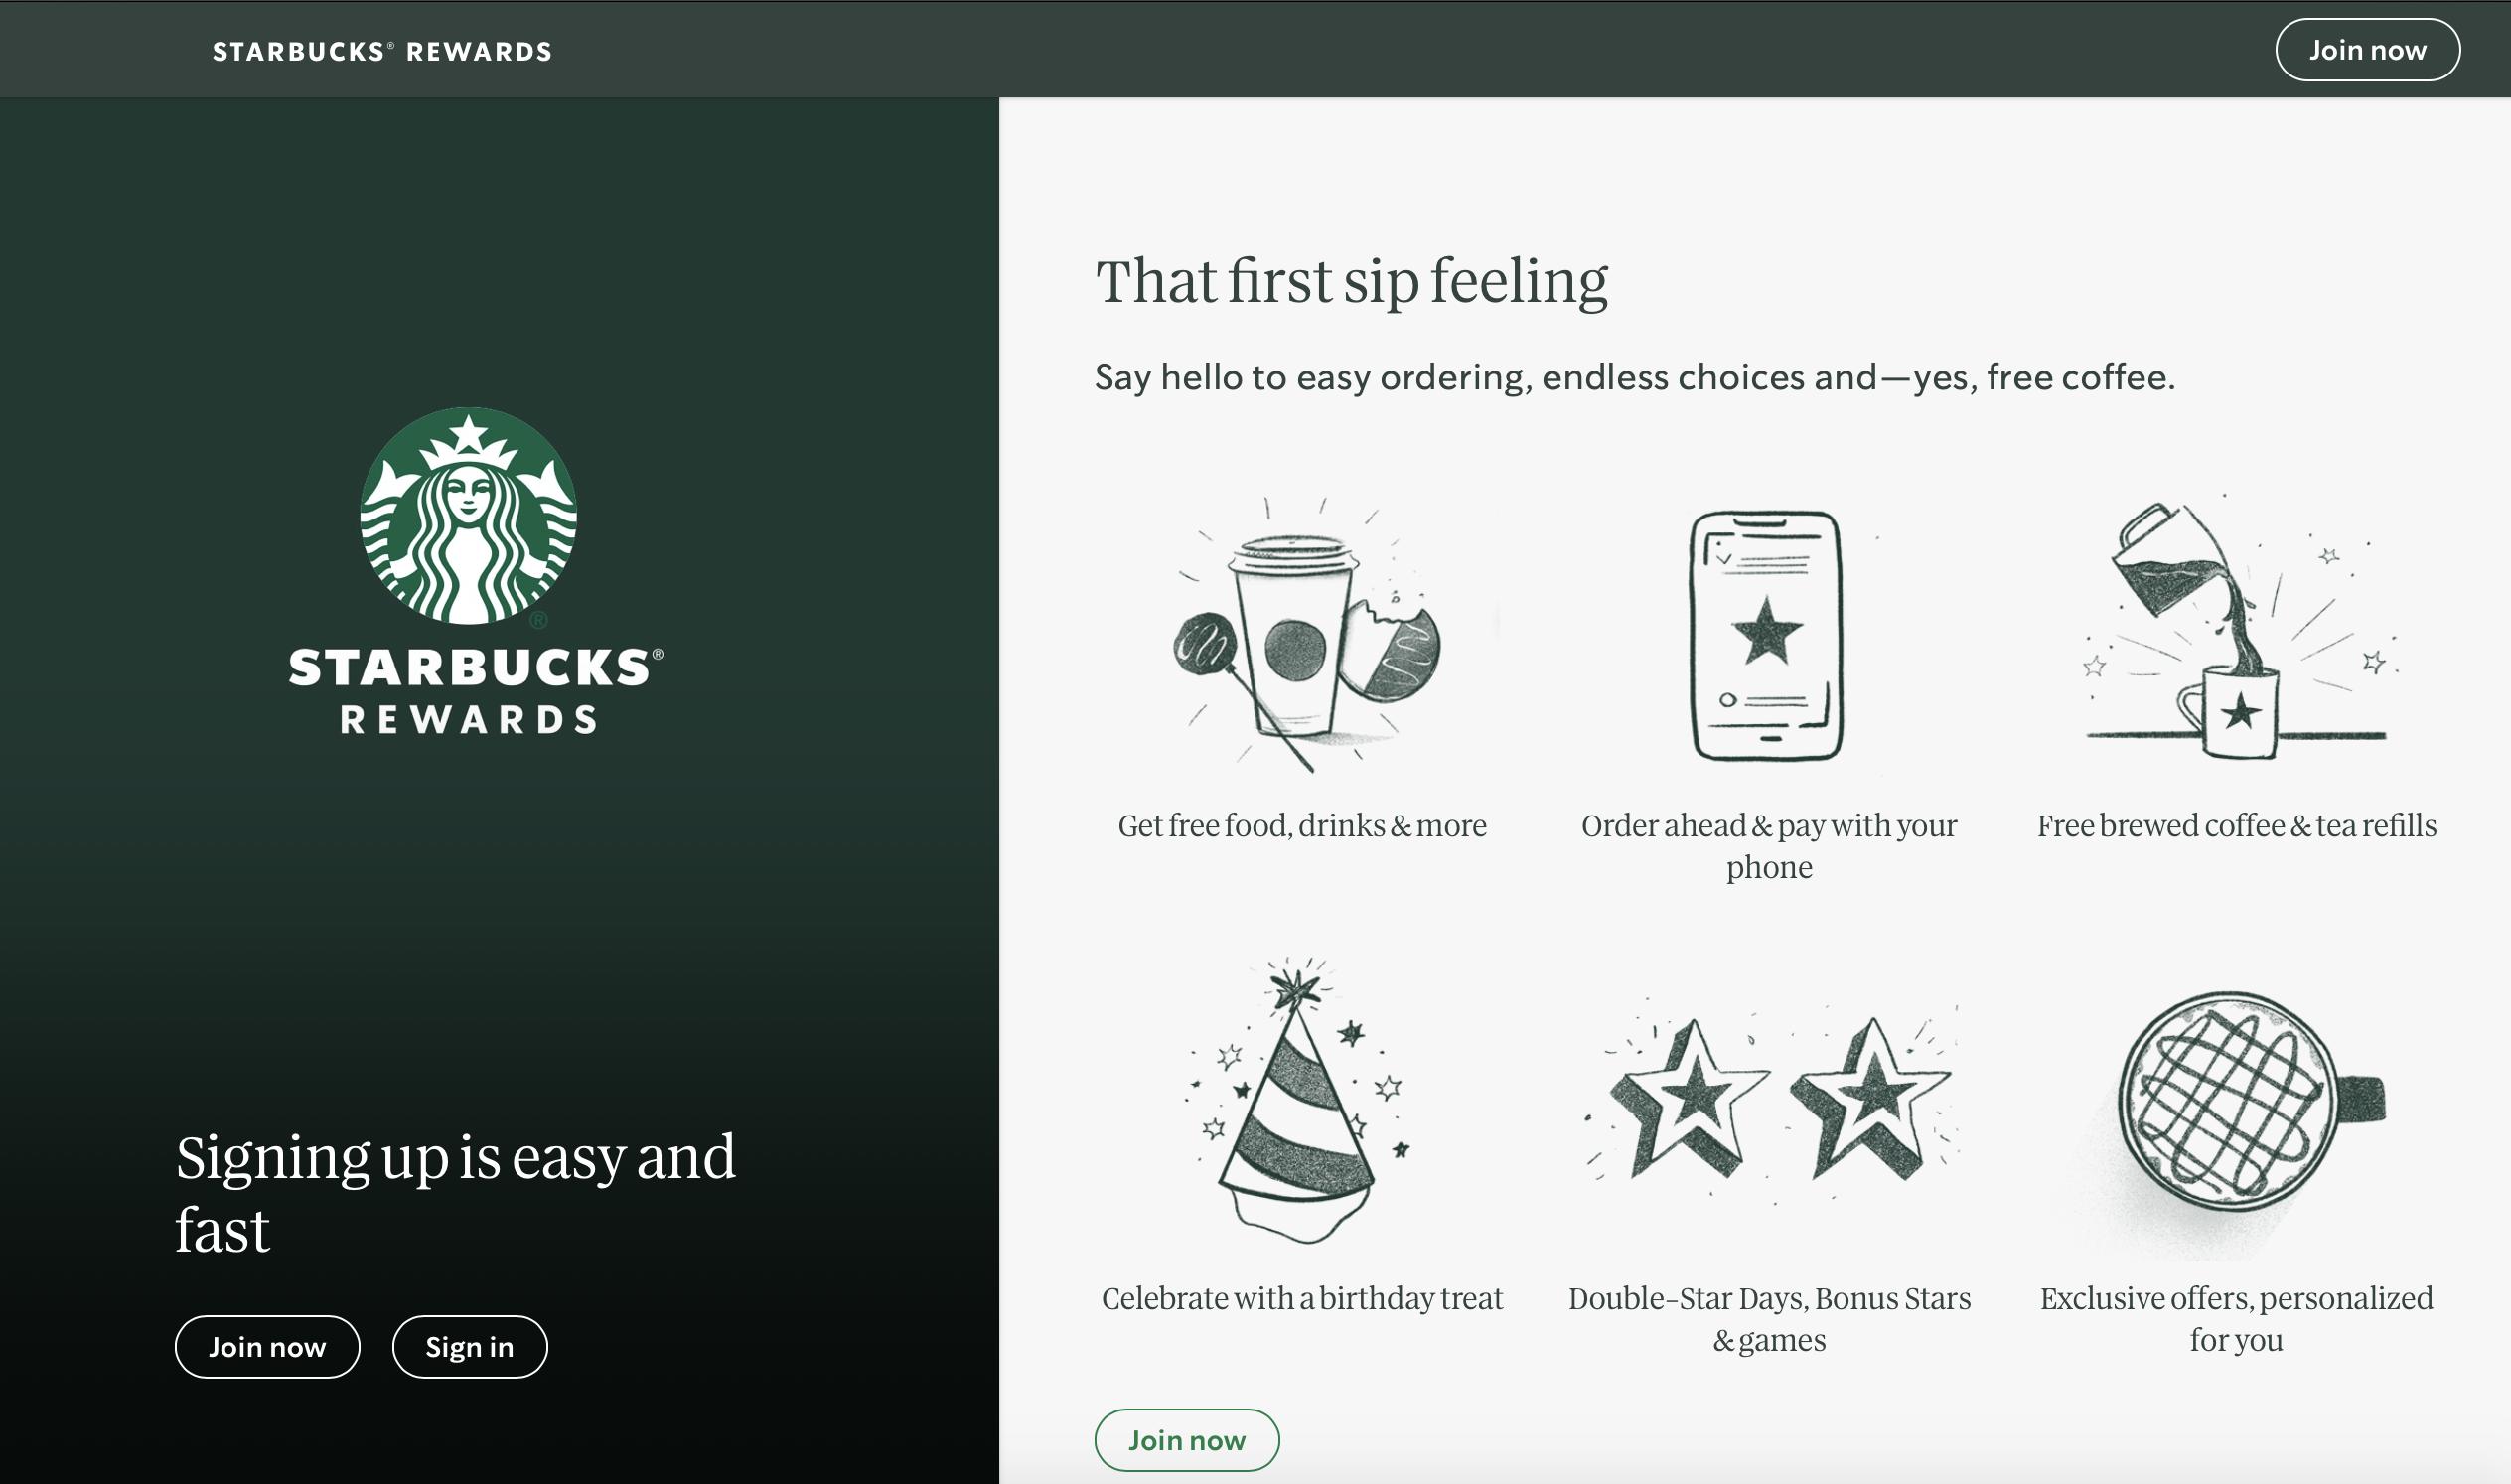 Starbucks Rewards: facilities to pay and lots of bonus